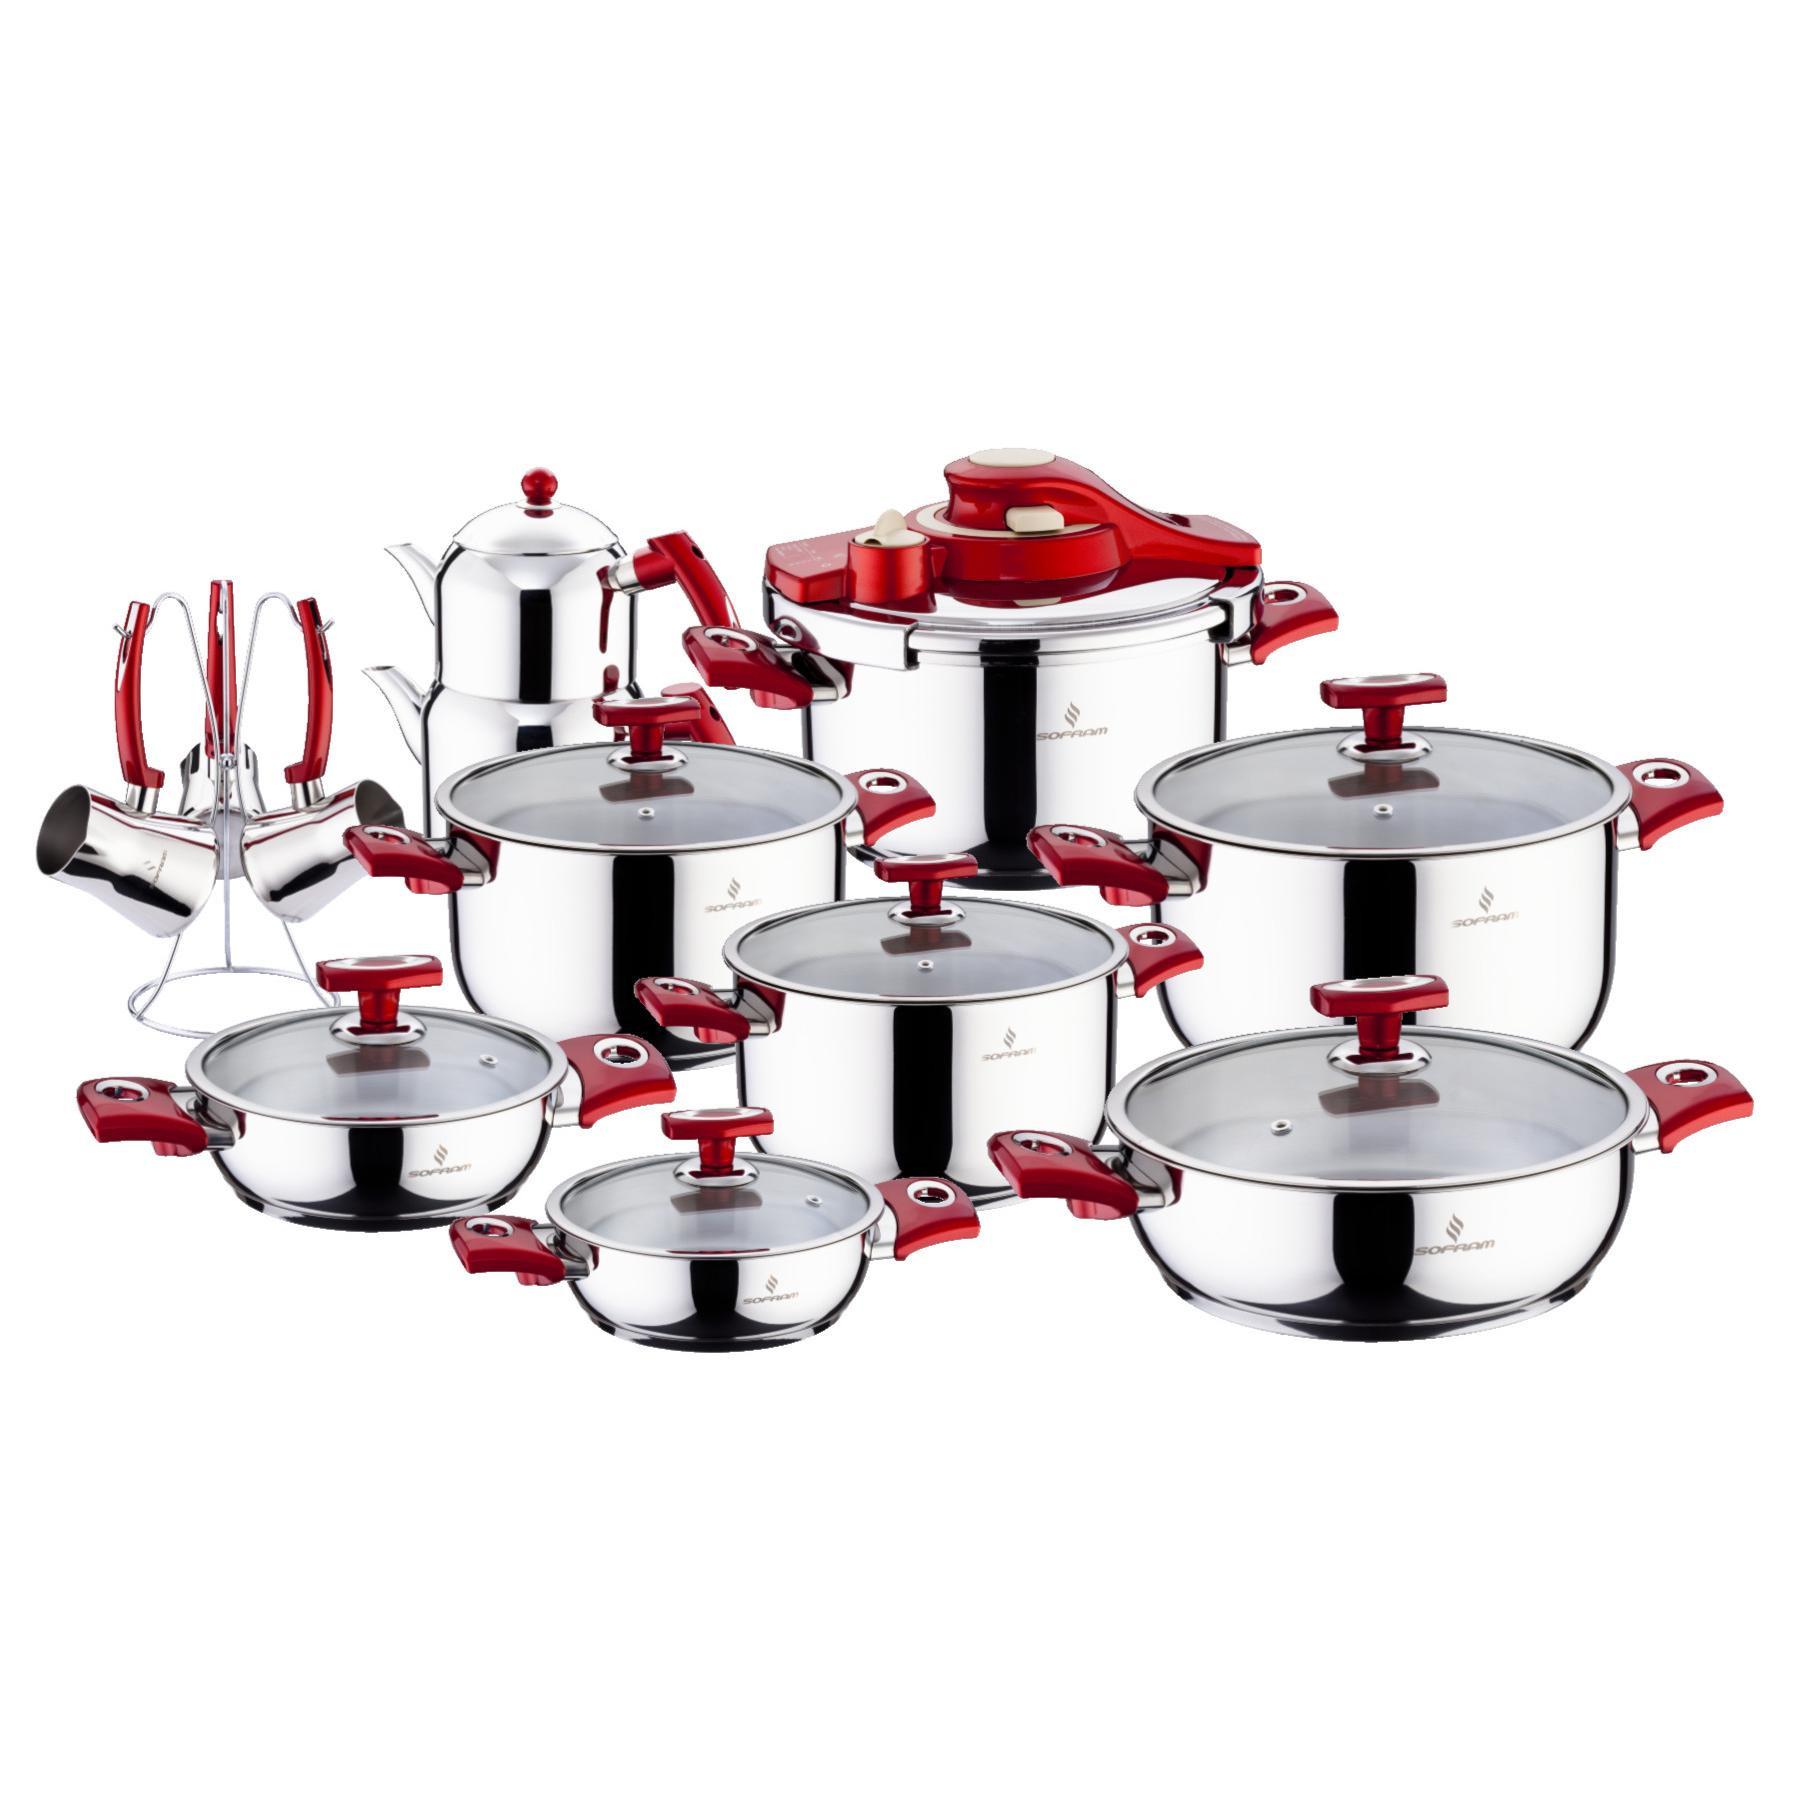 Sofram KUPON 22 Pieces Red Cookware Set